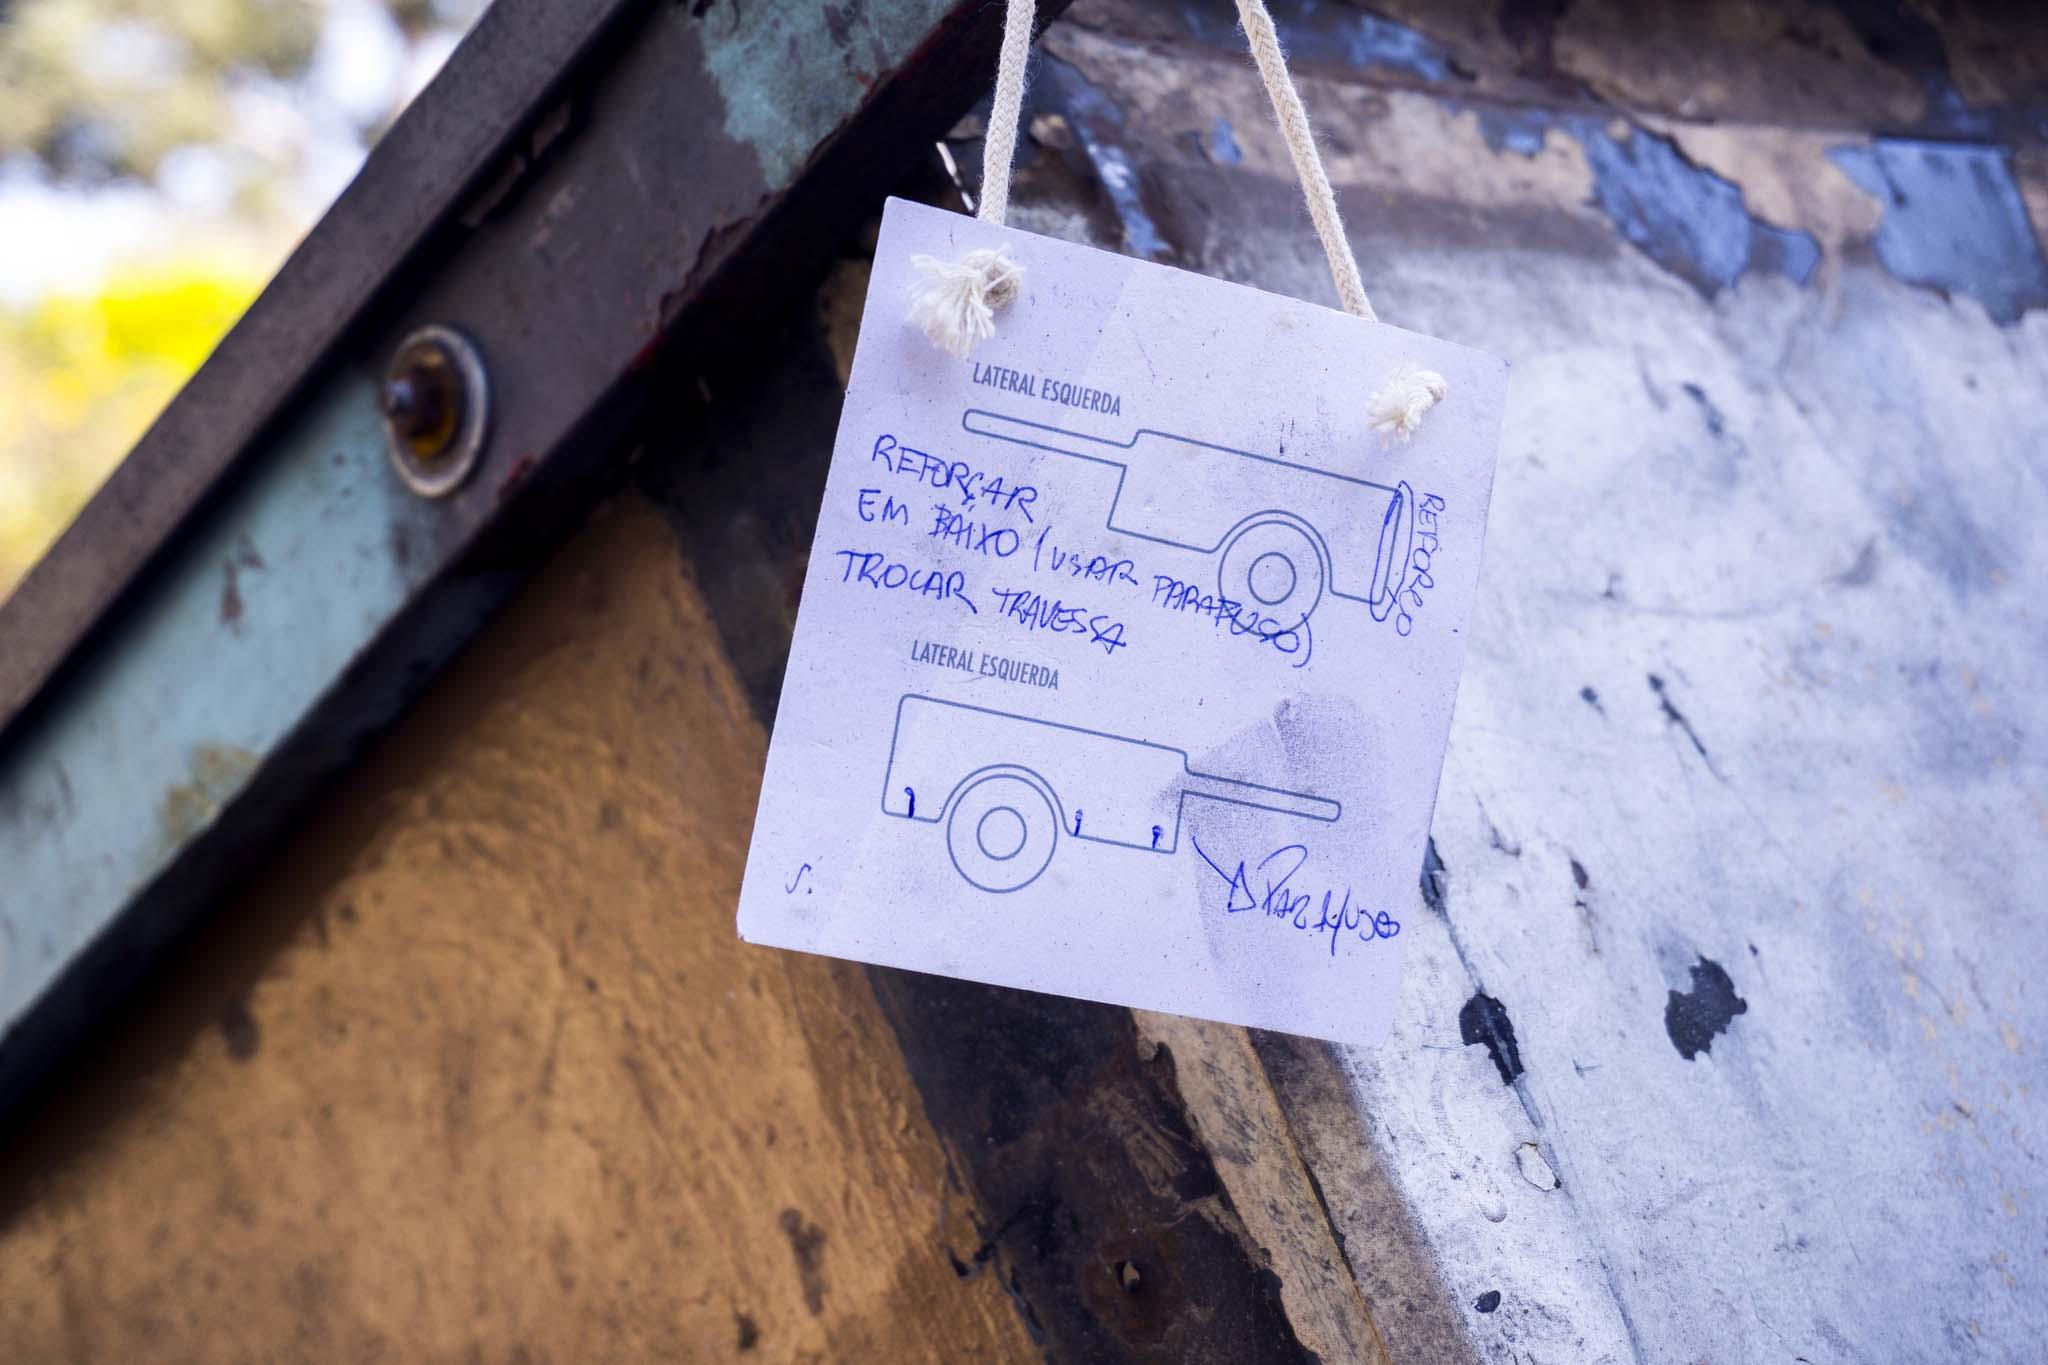 pimp-my-carroça-mundano-social-arte-ambiental-7